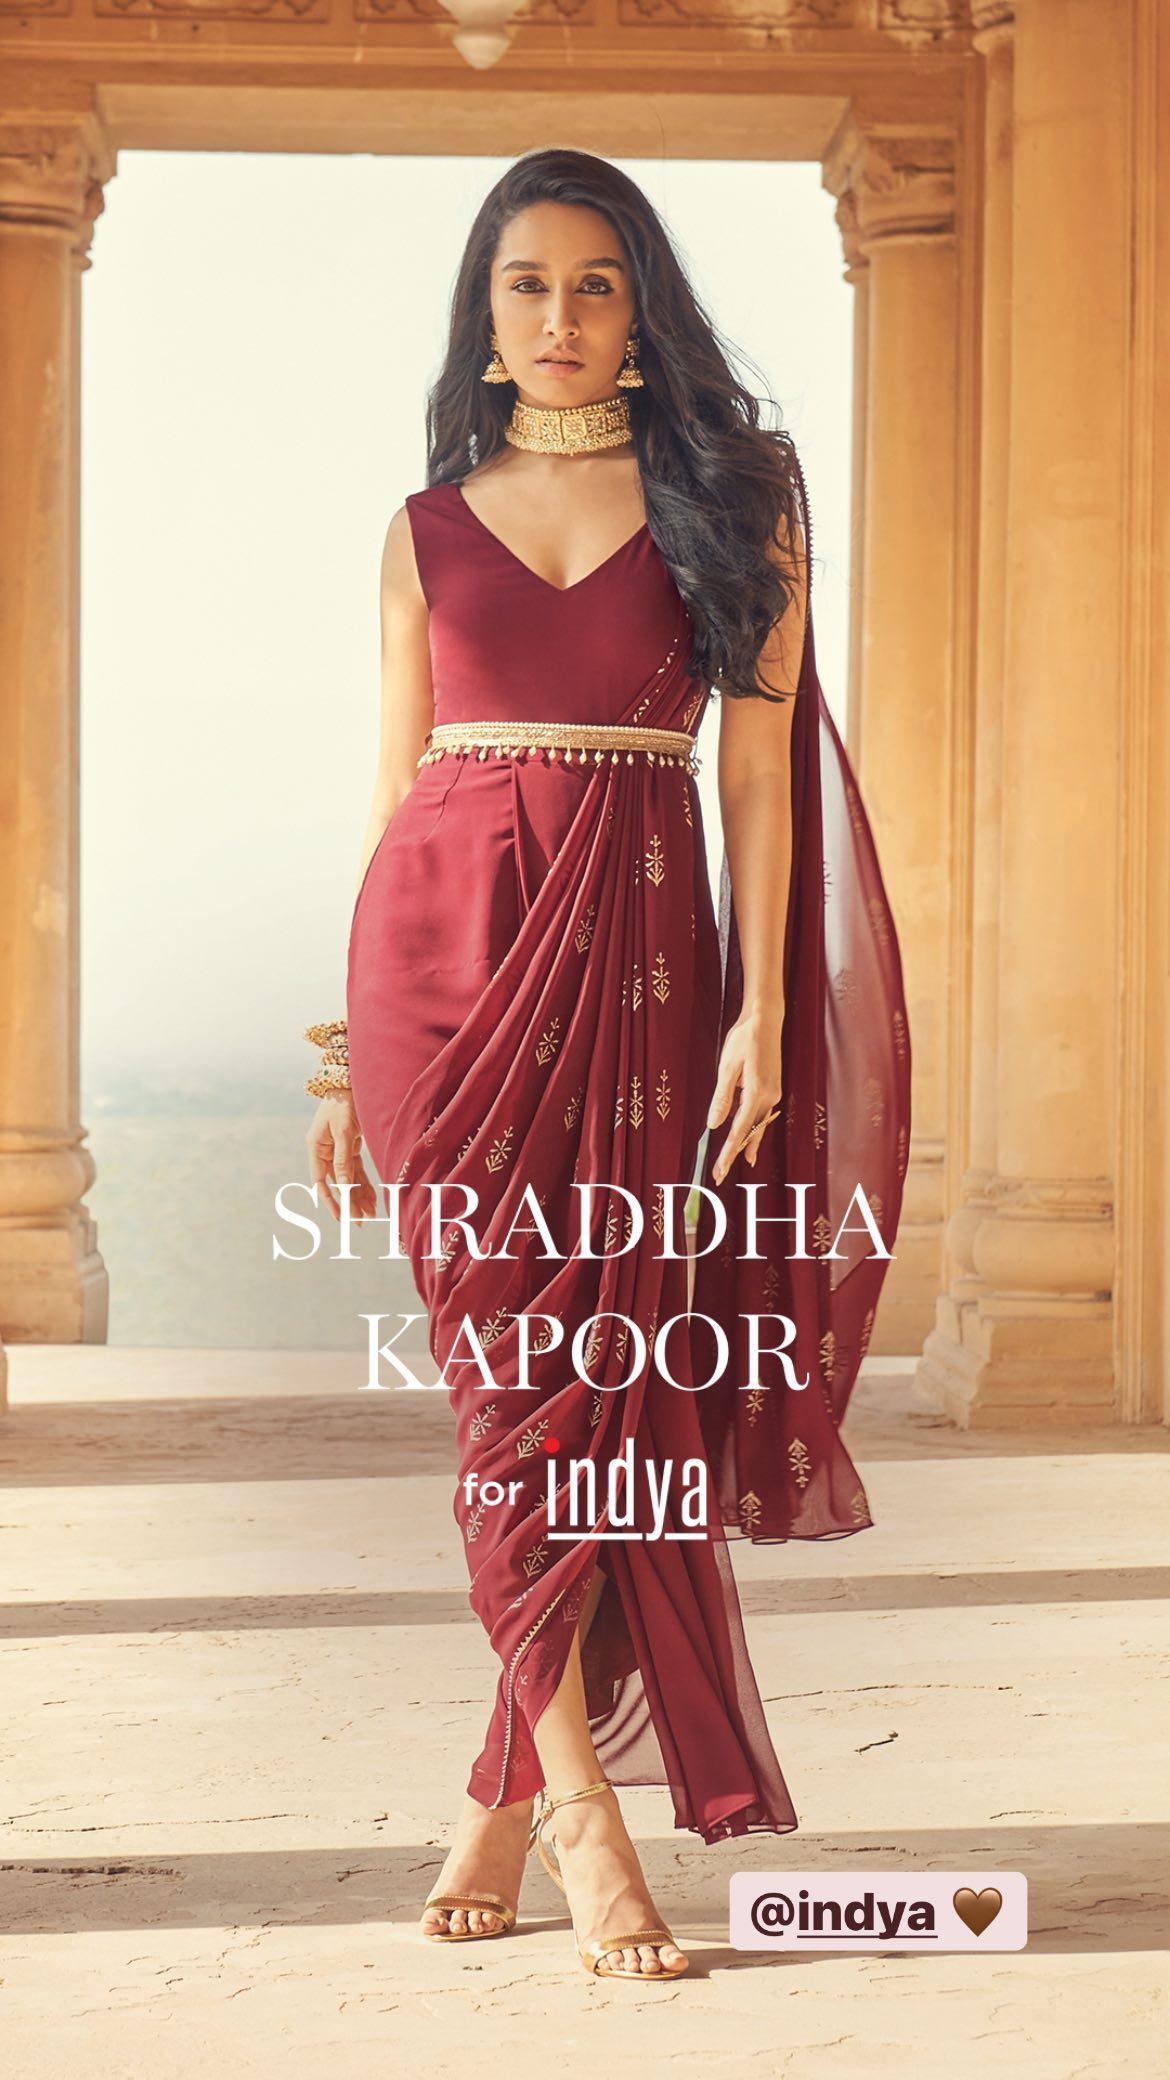 Shraddha Kapoor in wine foil pallu belted saree tunic from Indya(Instagram/shraddhakapoor)